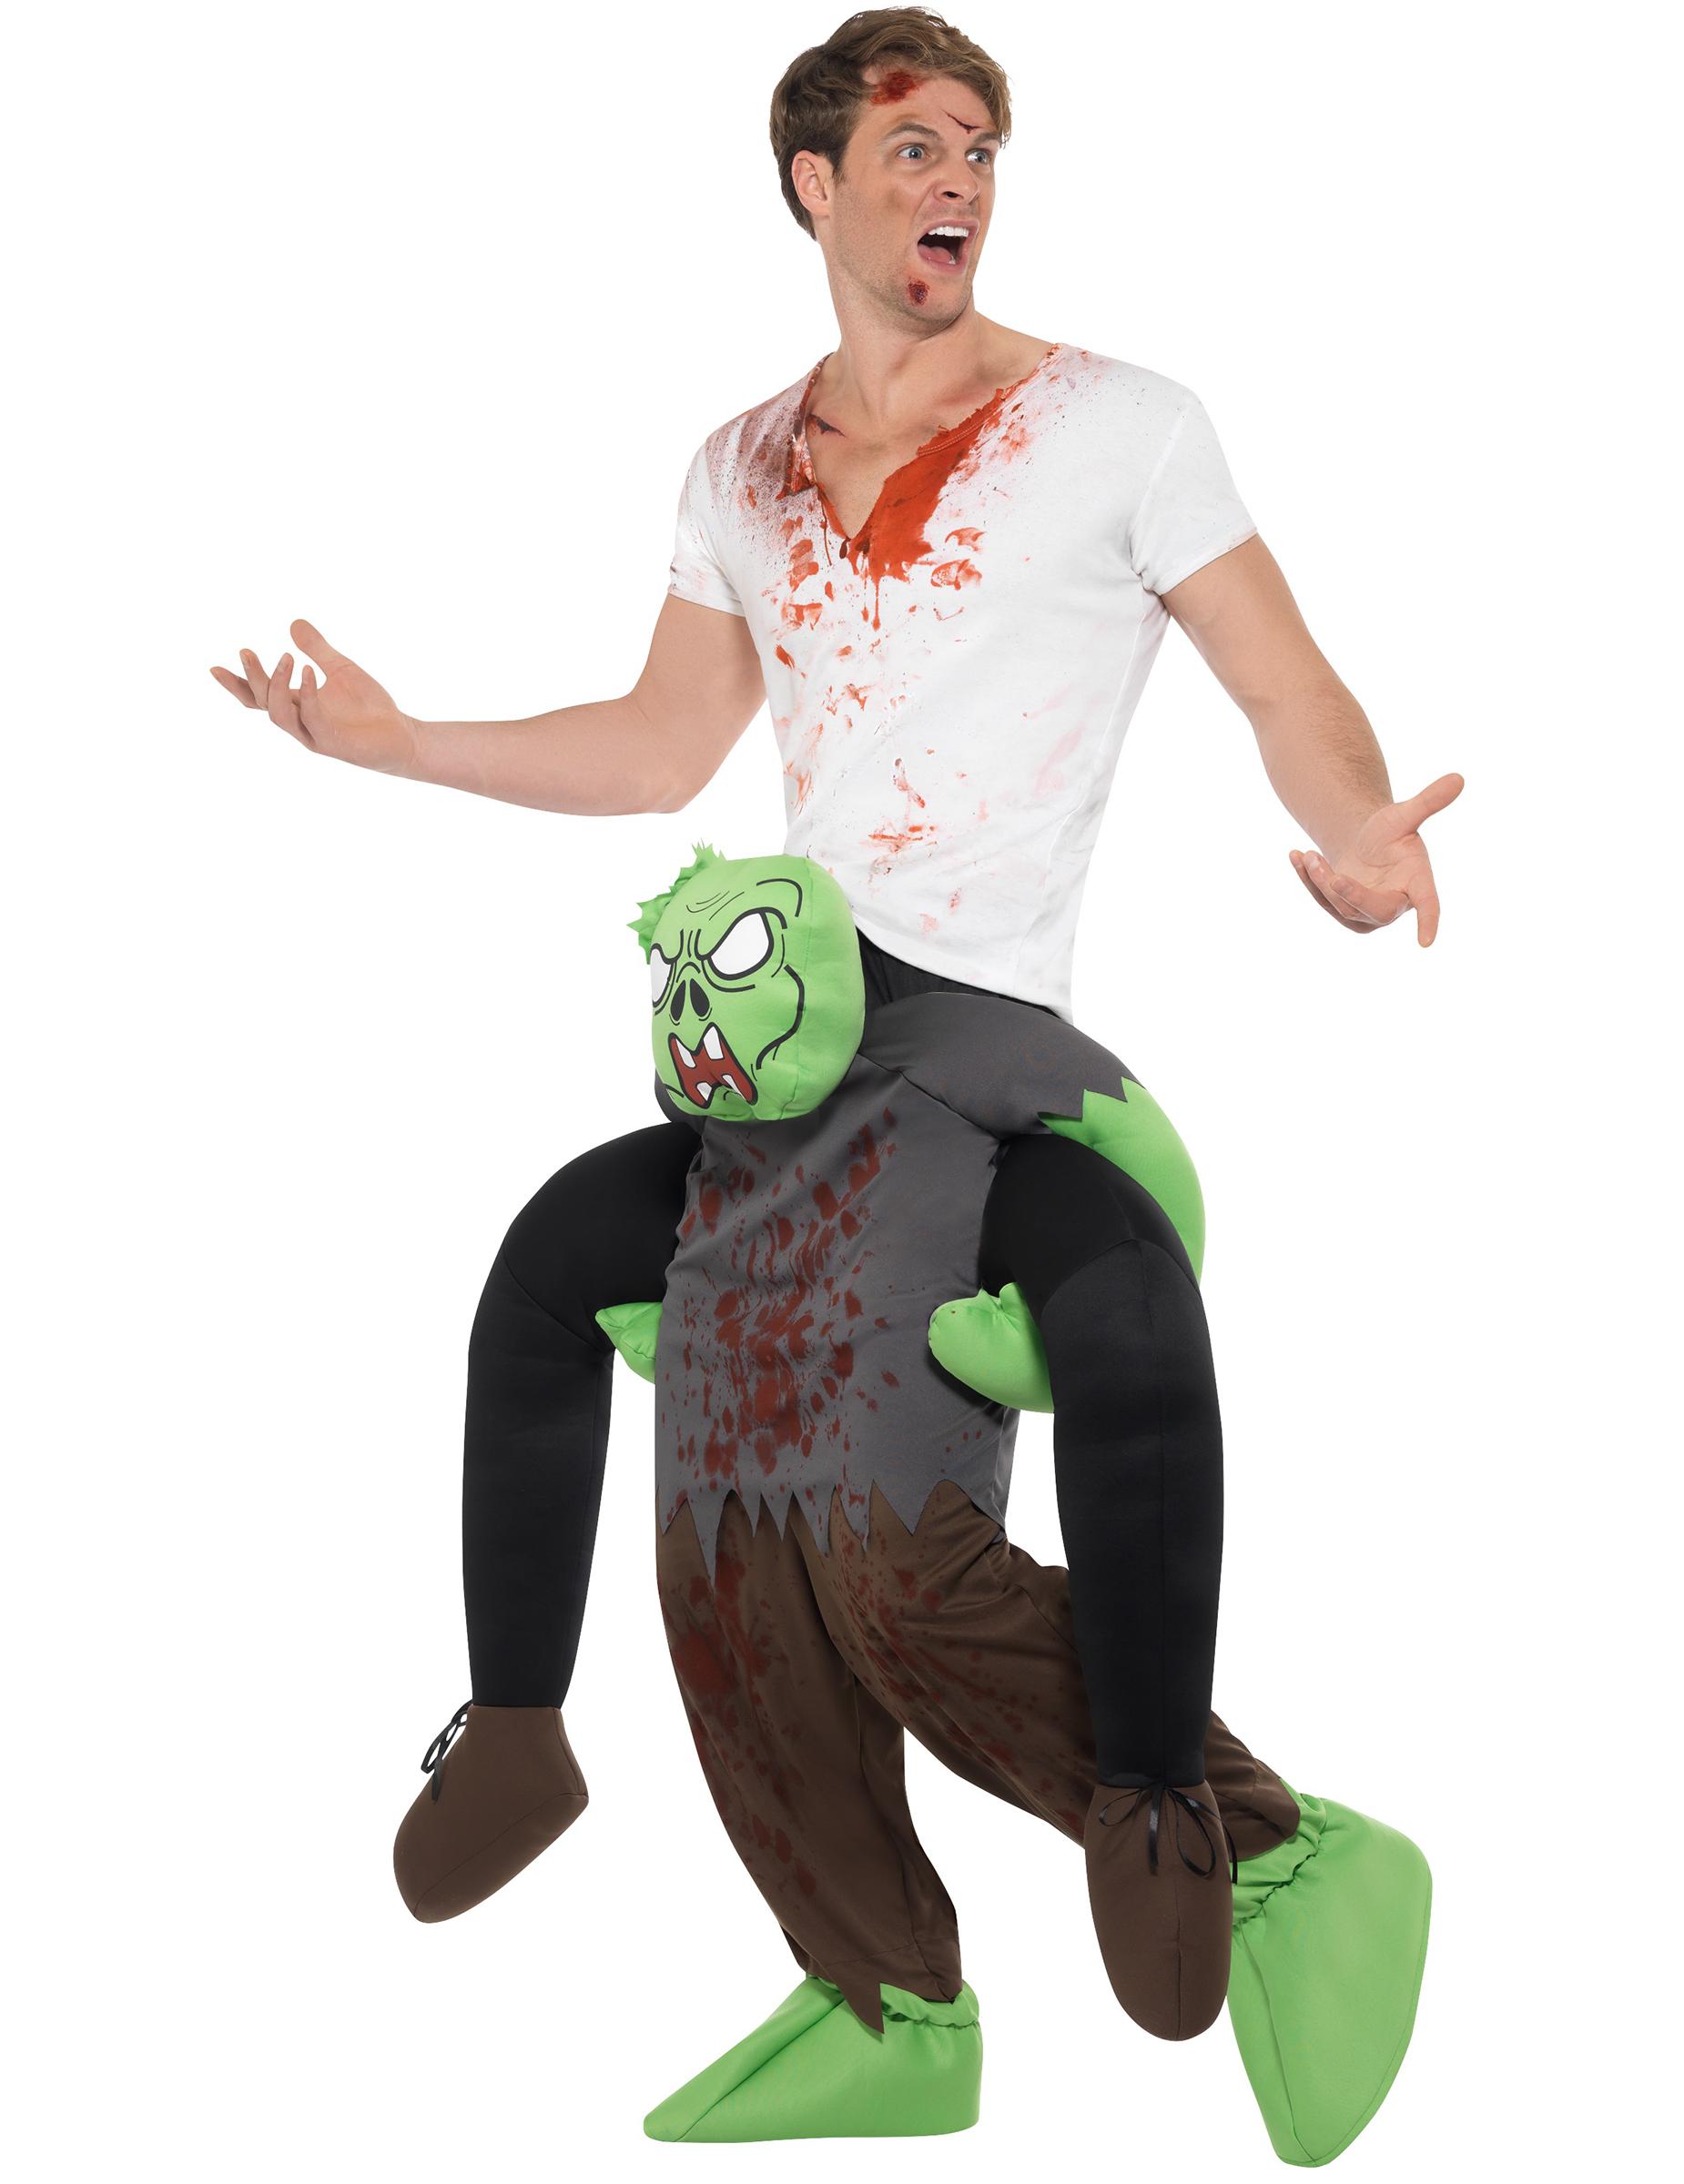 Kidnappad av en zombie - Carry me-dräkt till Halloween-1 0d73afd548125